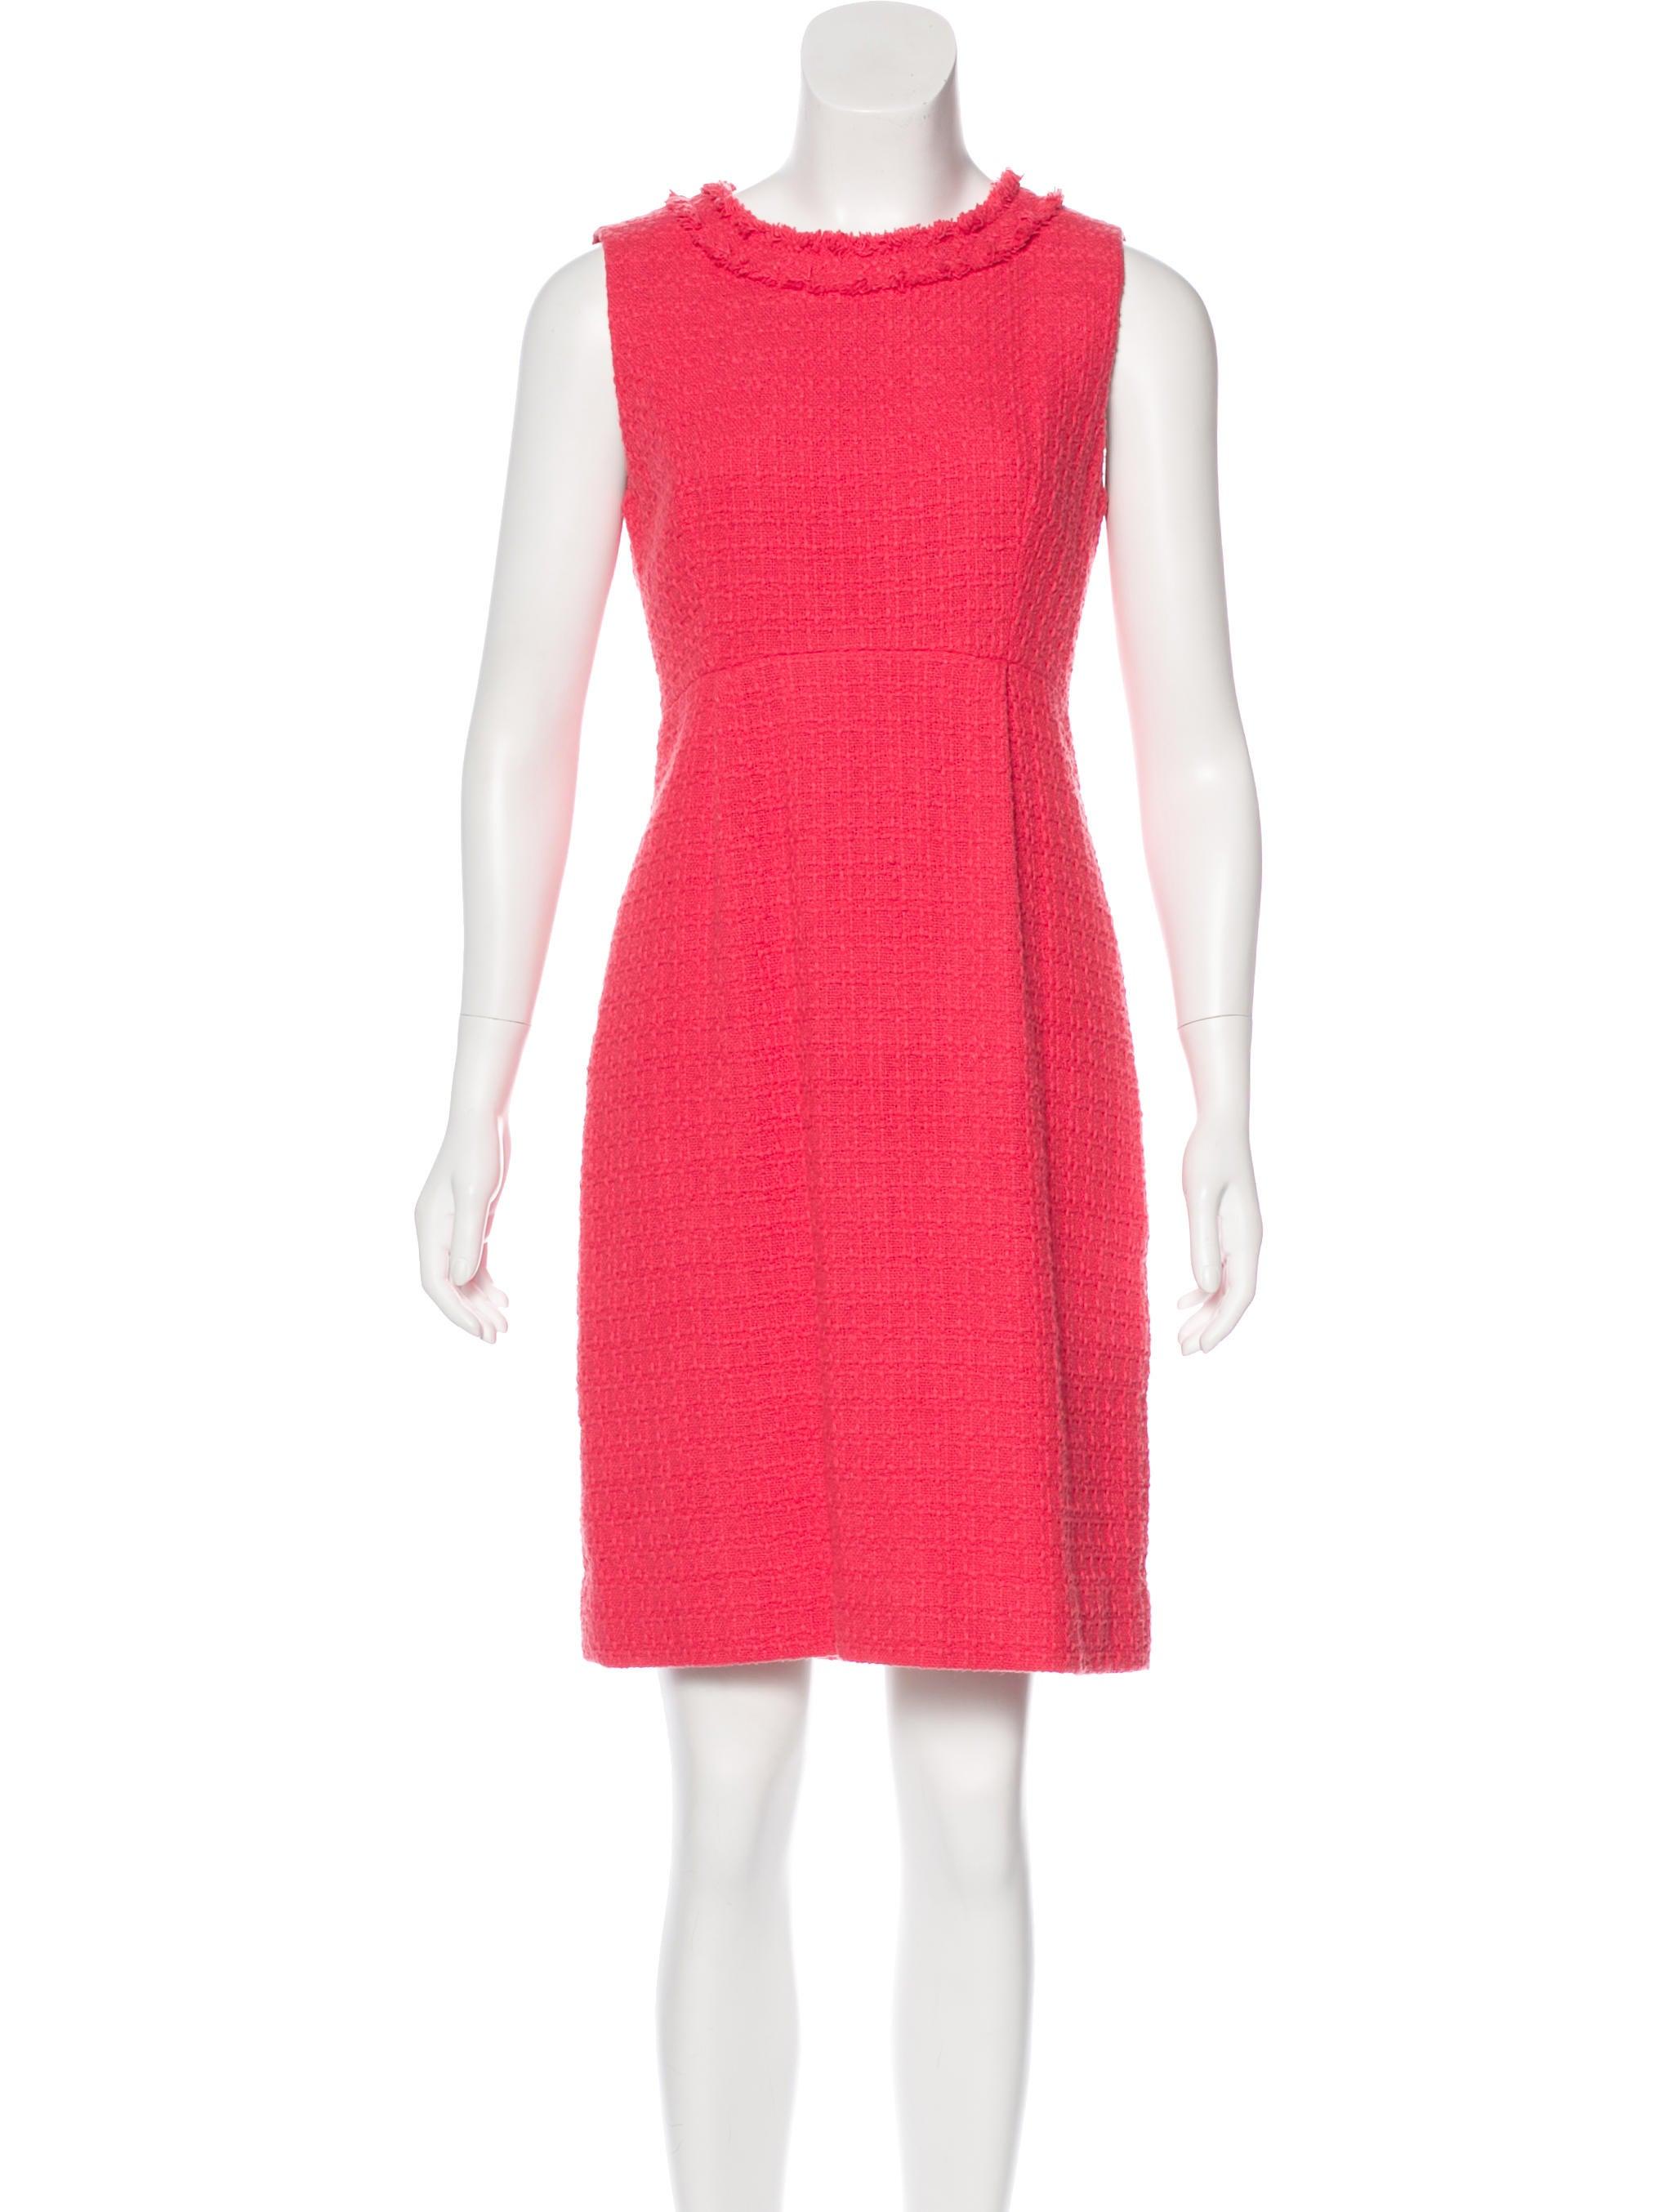 Kate Spade New York Tweed Sleeveless Dress Clothing